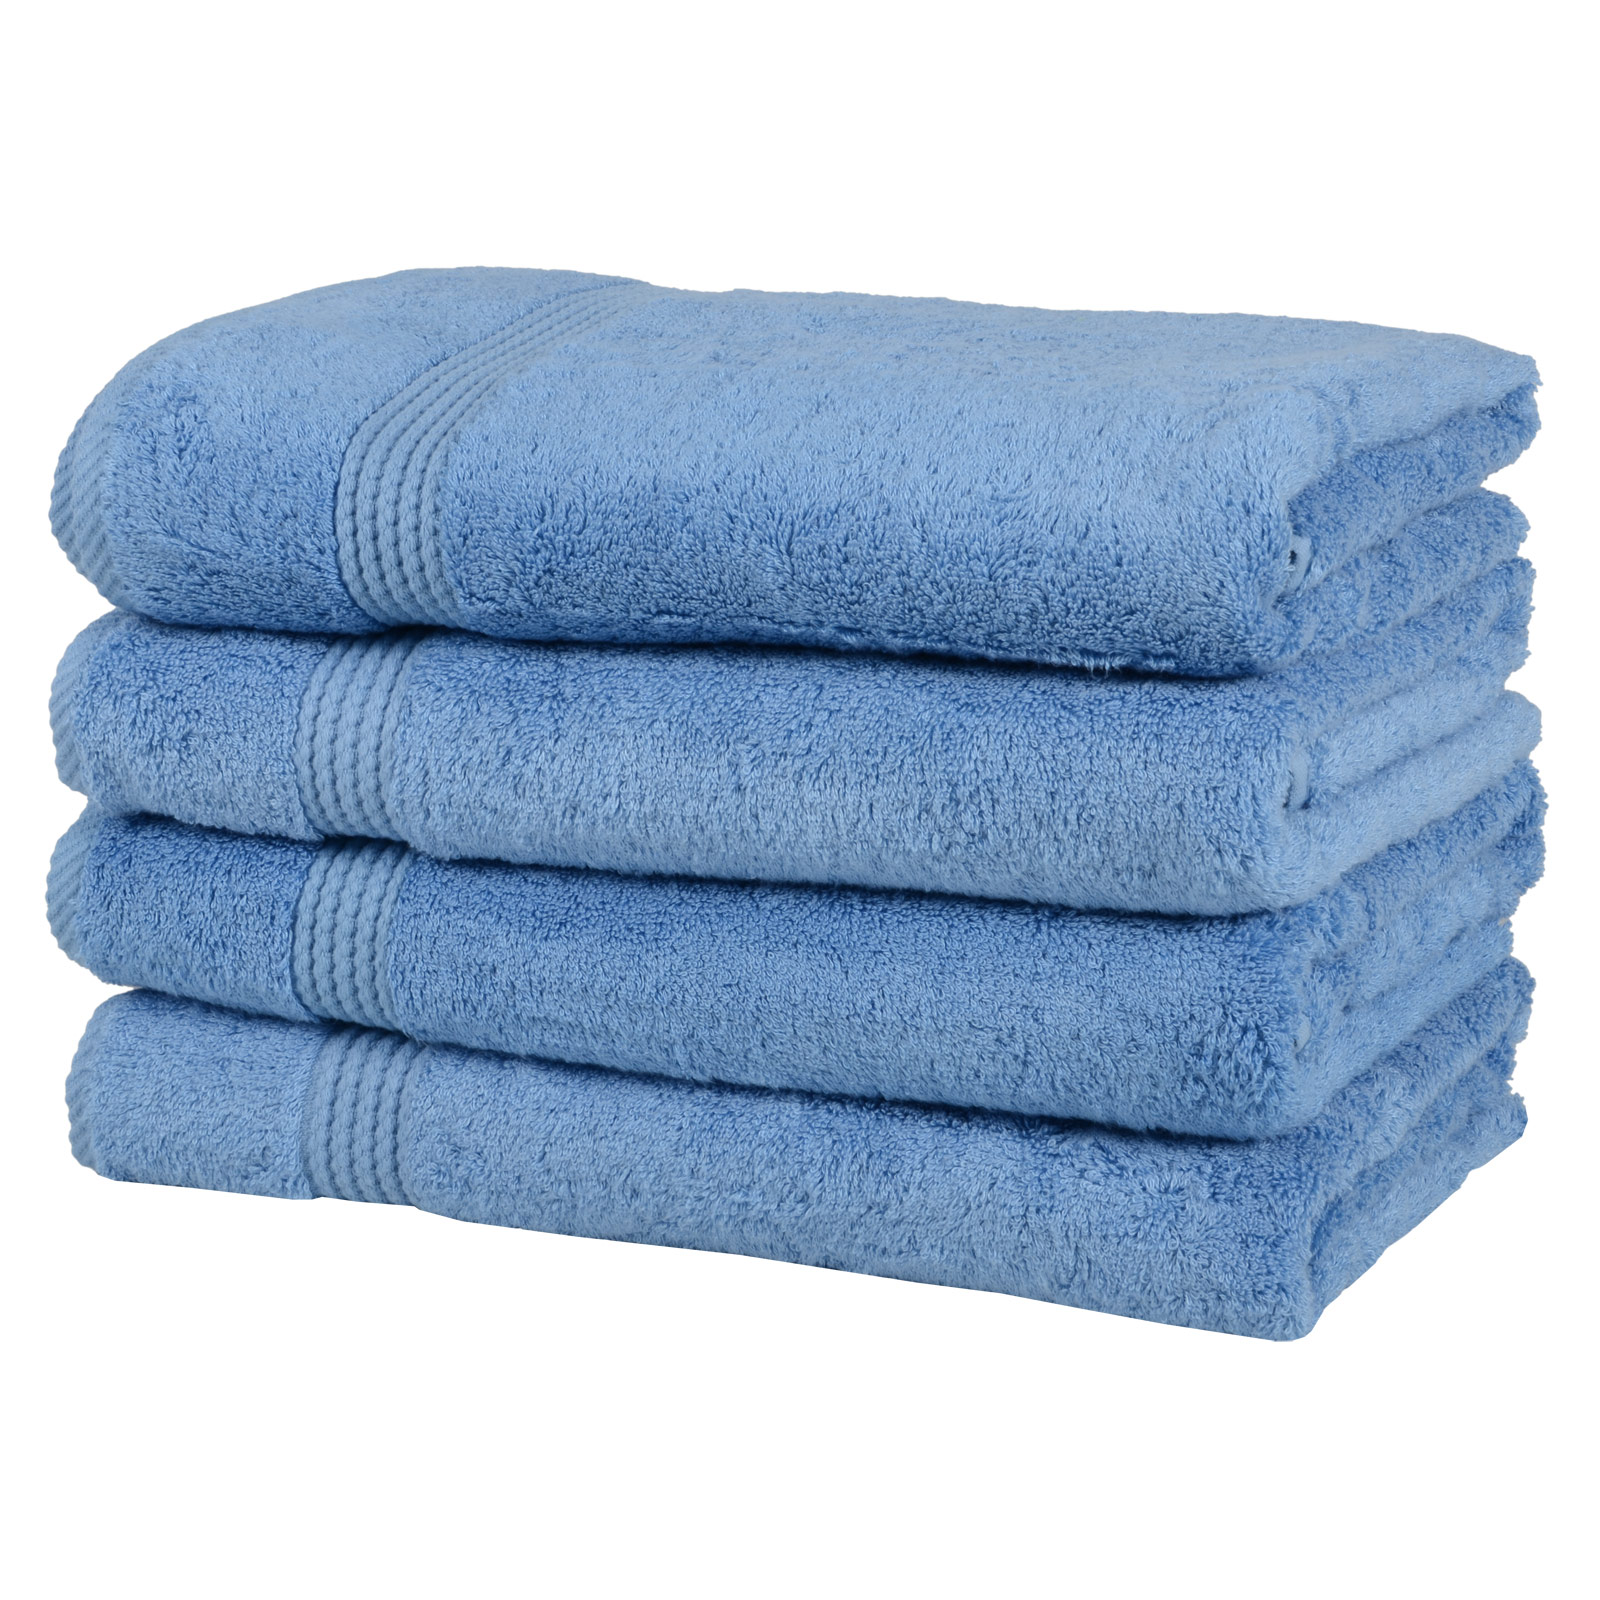 Bathroom Linen Bath Sheet Bath Towel Hand Towels